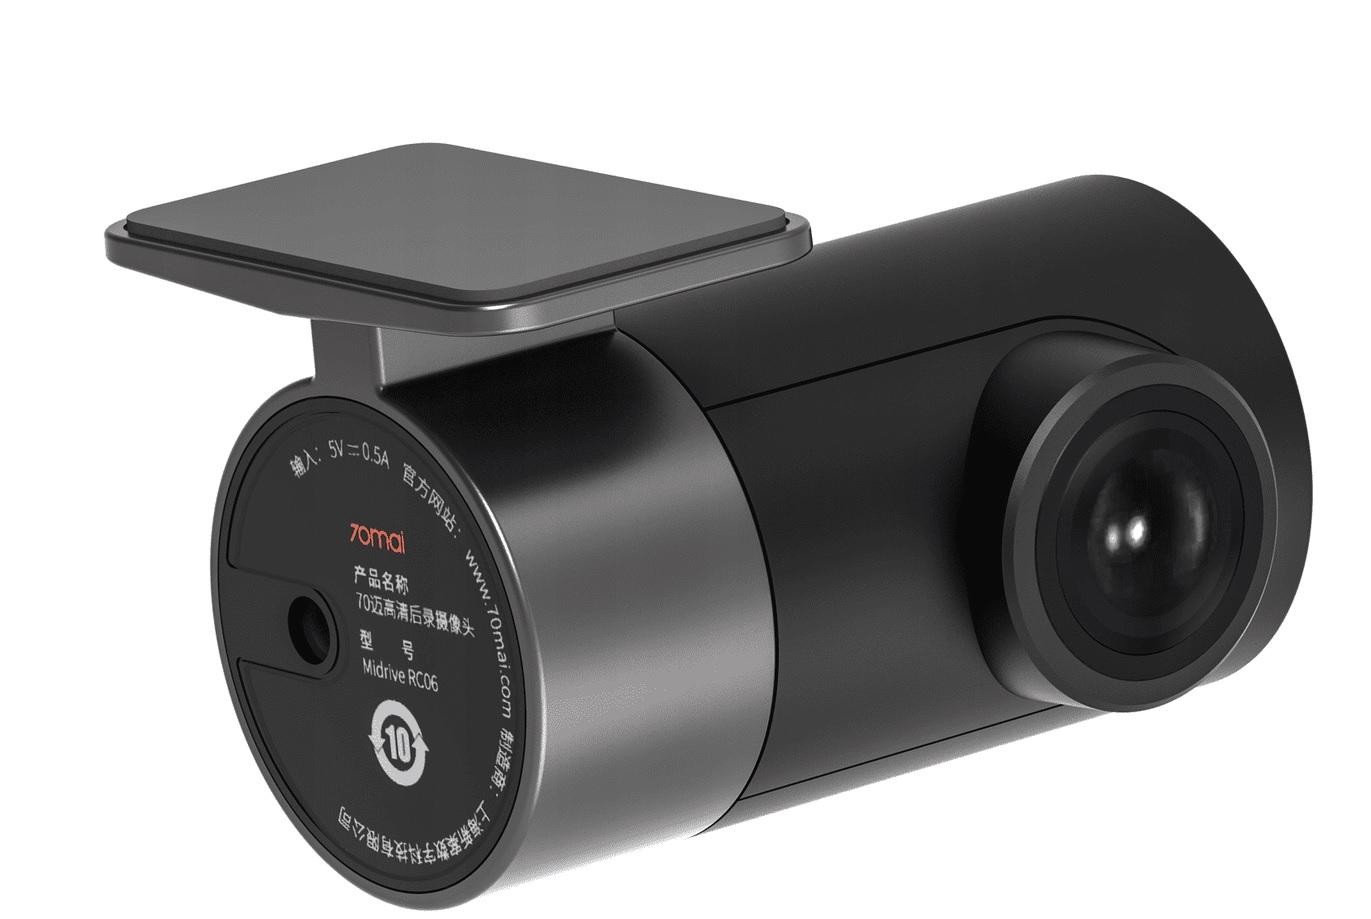 Kamera wsteczna 70MAI RC06